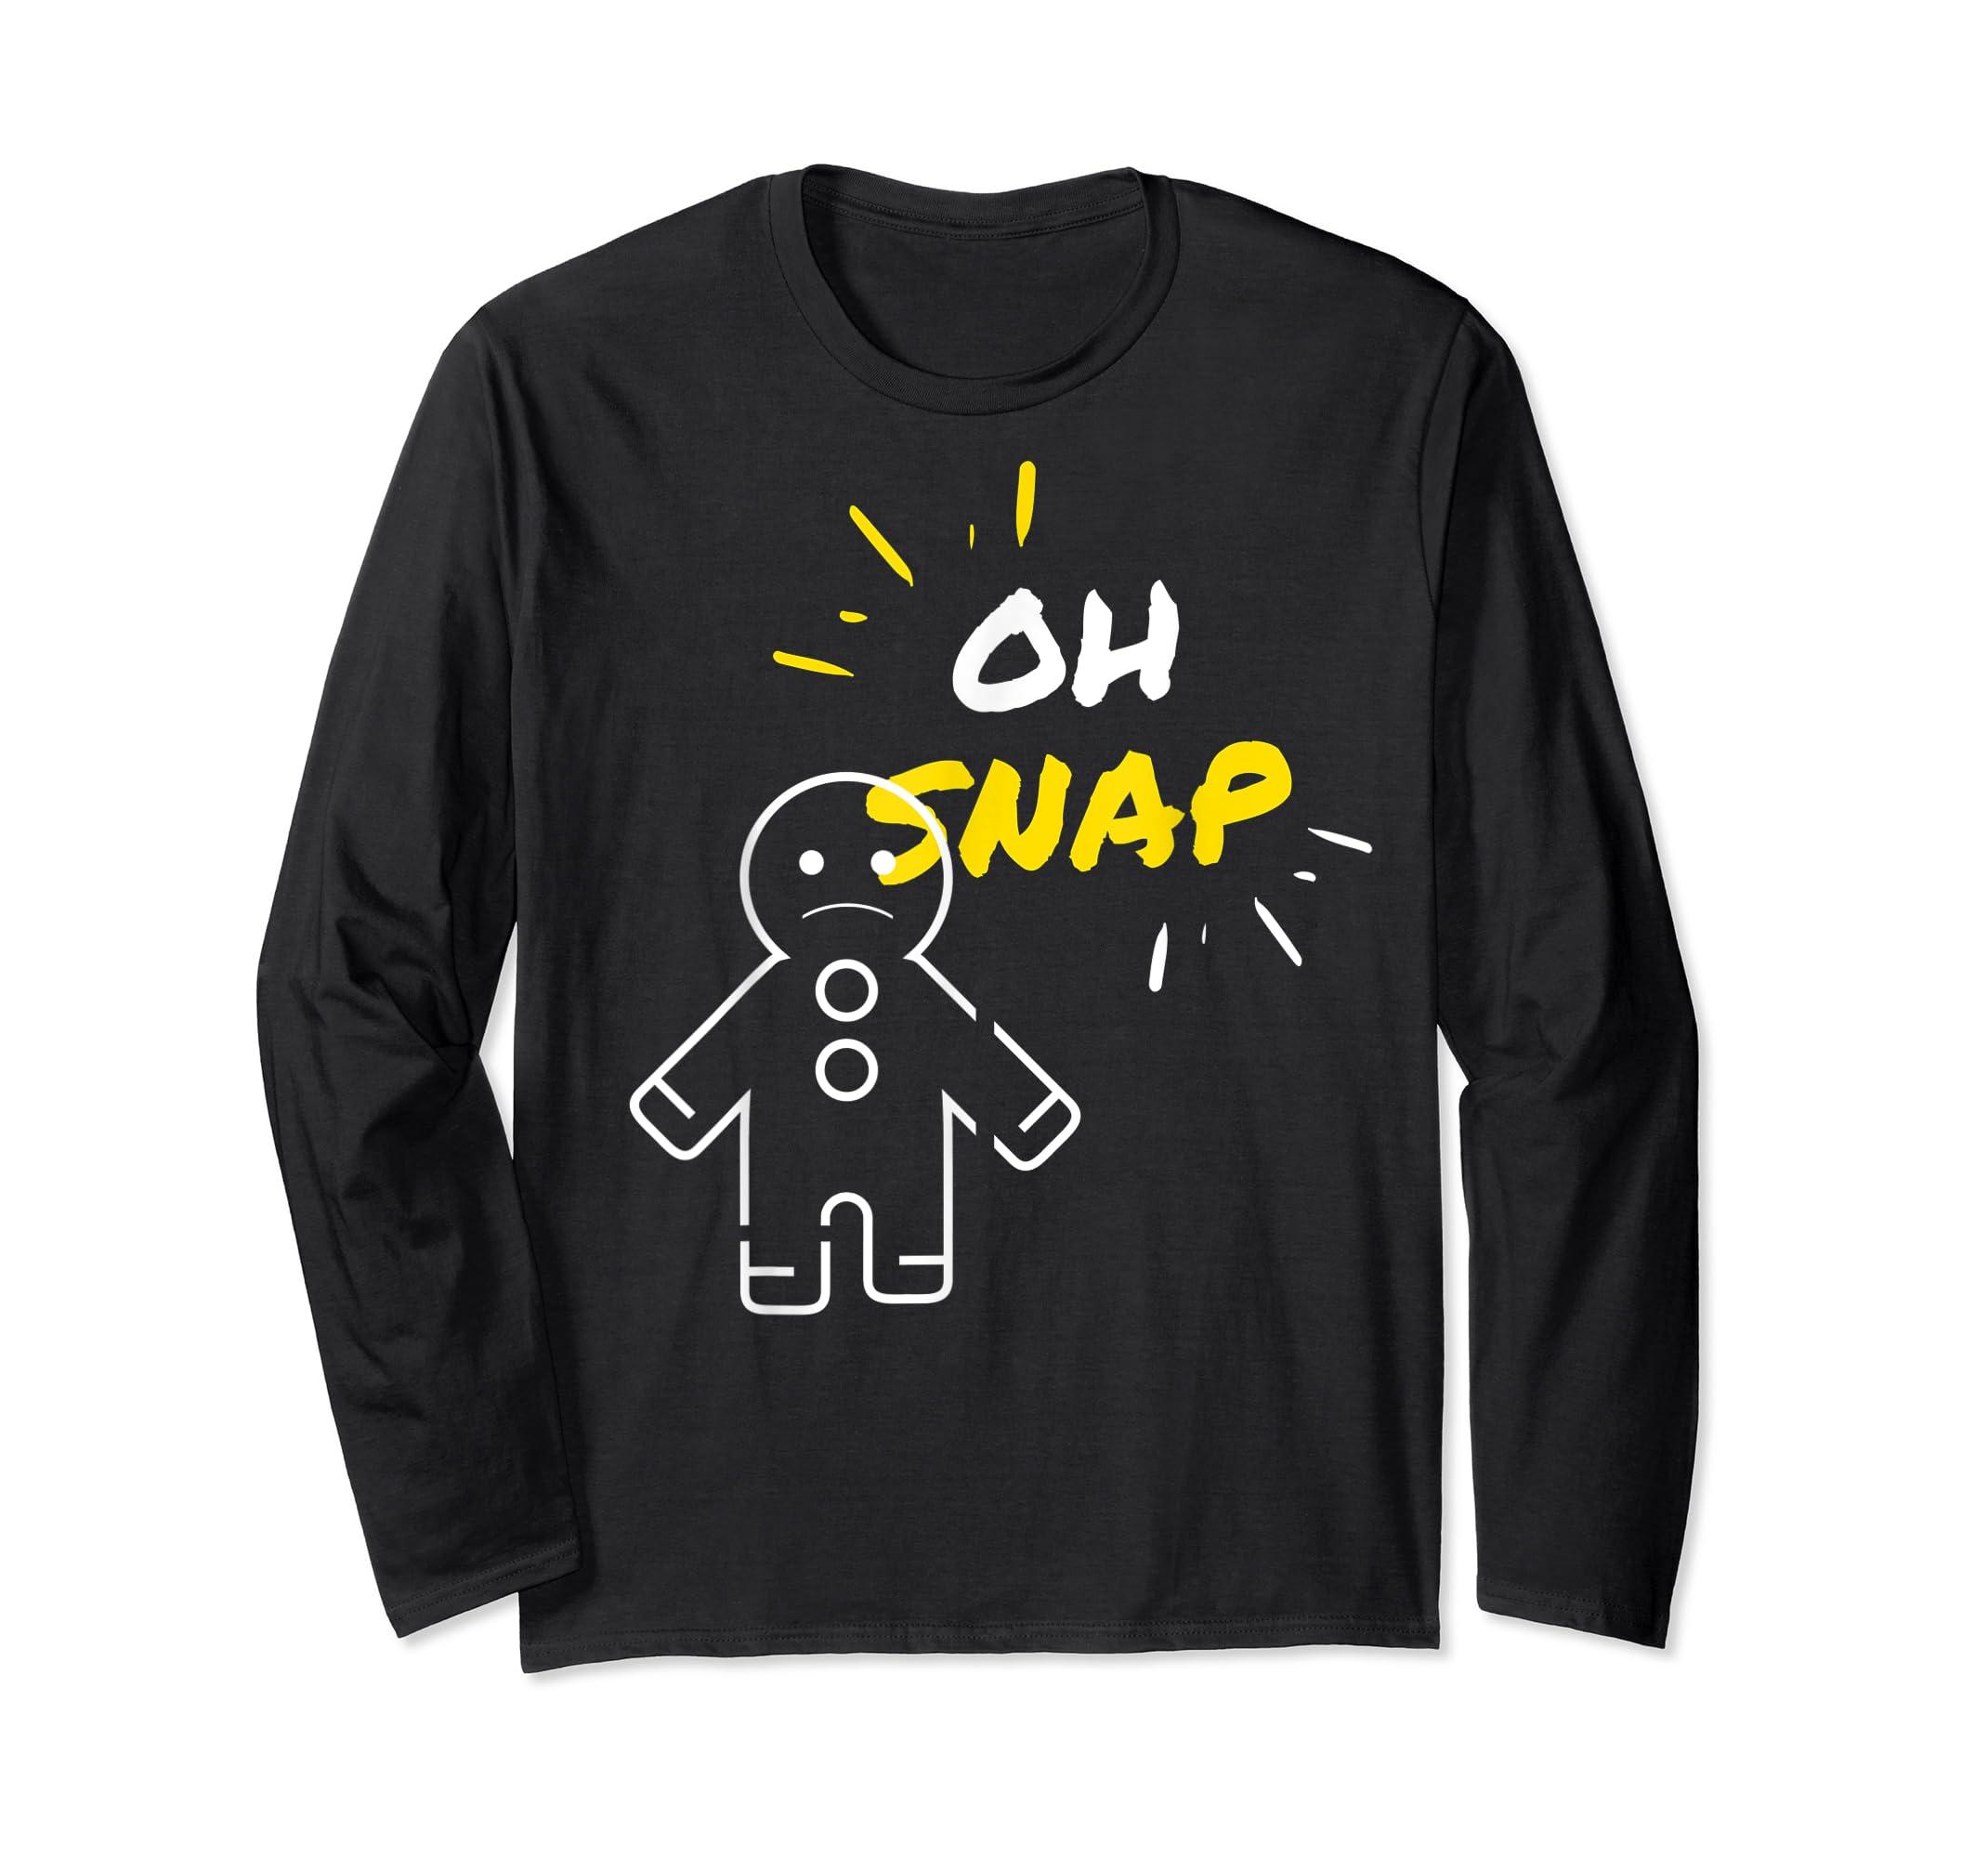 Oh Snap Christmas Gingerbread Man Holiday Cookies Funny T-Shirt-Long Sleeve-Black